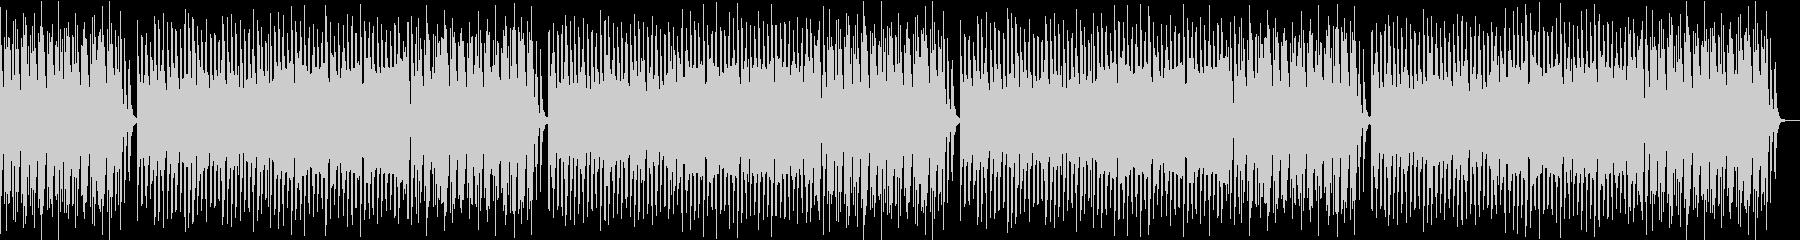 Comical / Quiet Karaoke's unreproduced waveform